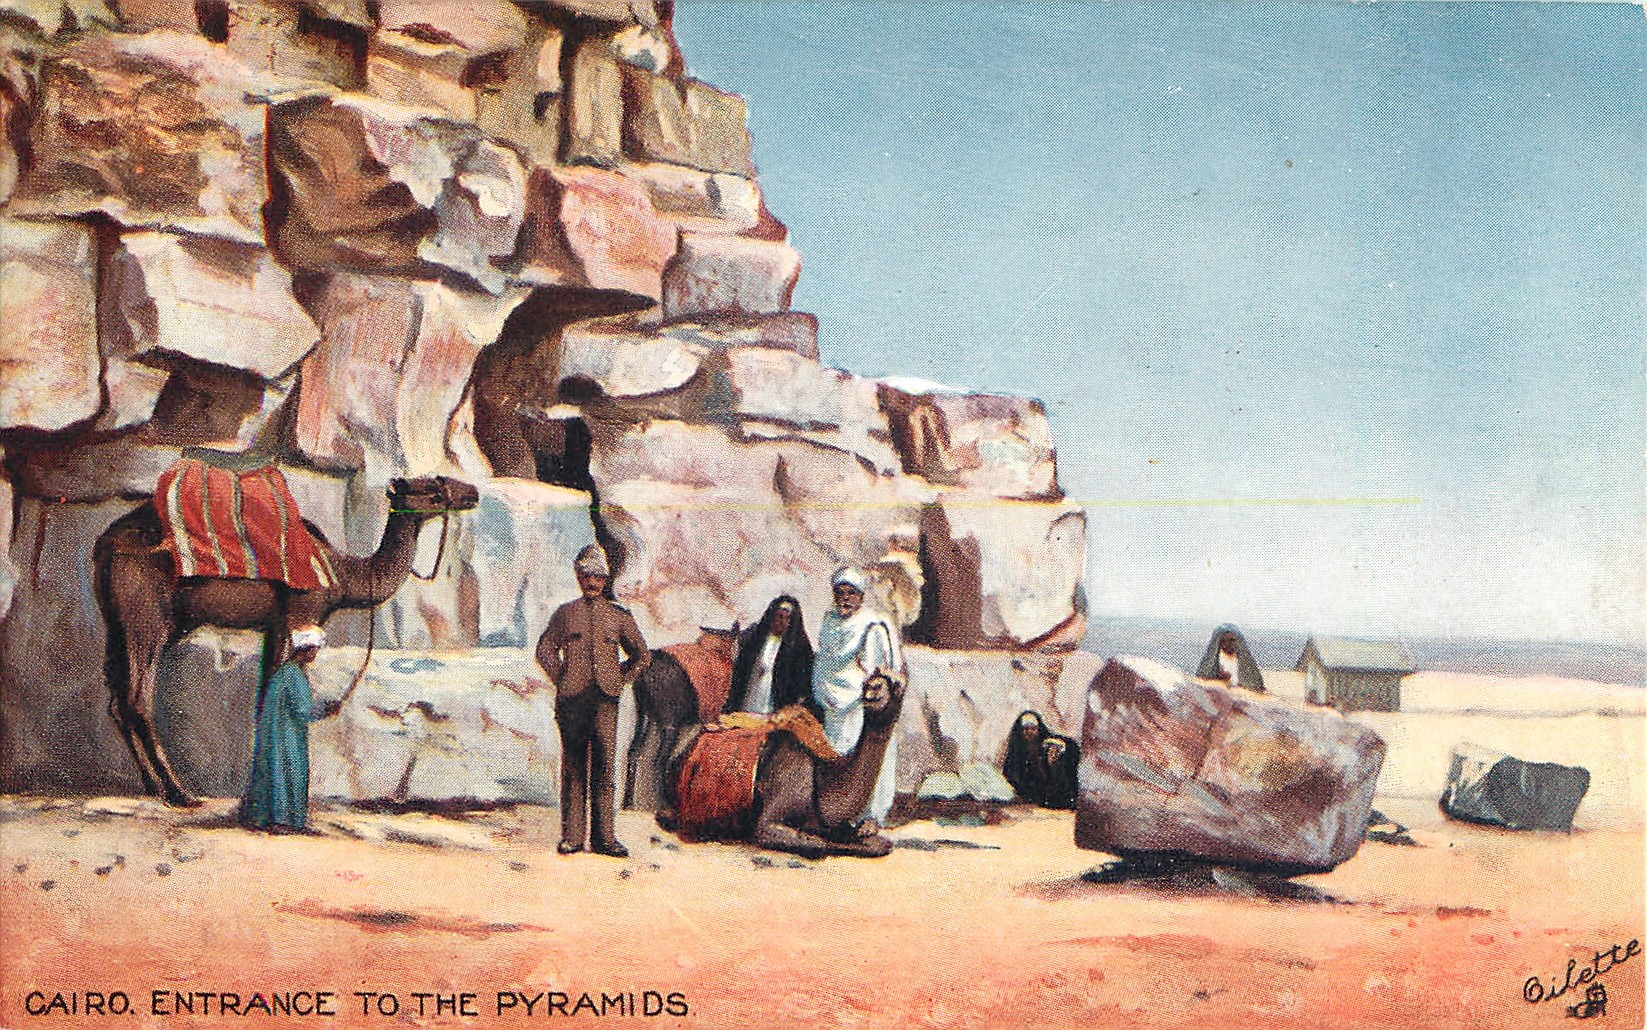 CAIRO, ENTRANCE TO THE PYRAMIDS